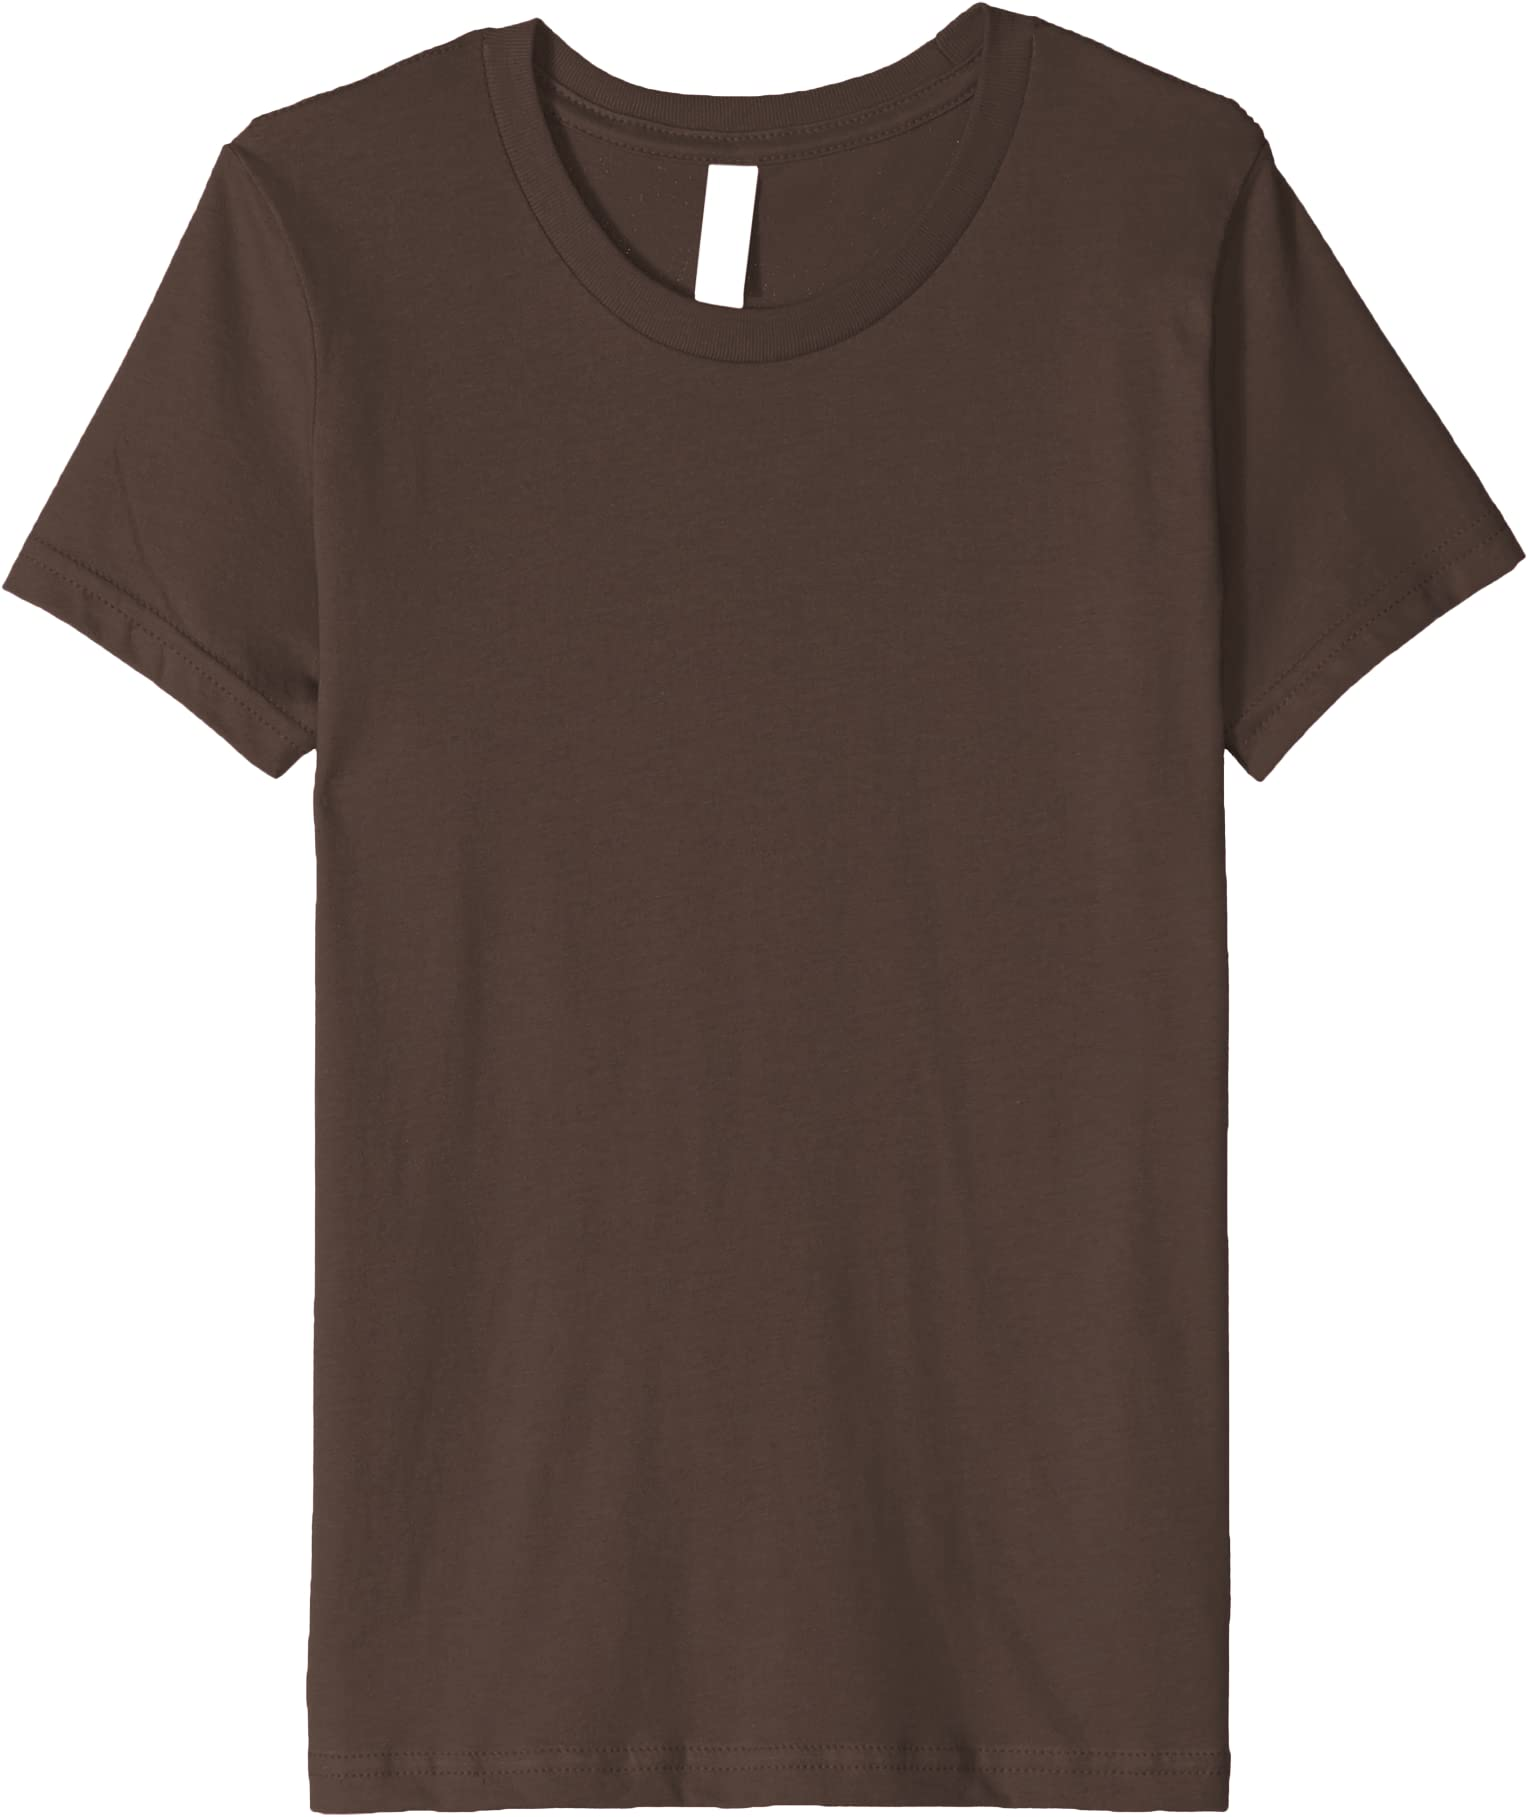 Youth Printed Boys Girls Take A Hike Hiker Teens Short Sleeve T Shirt Tees Shirts Tops Sport